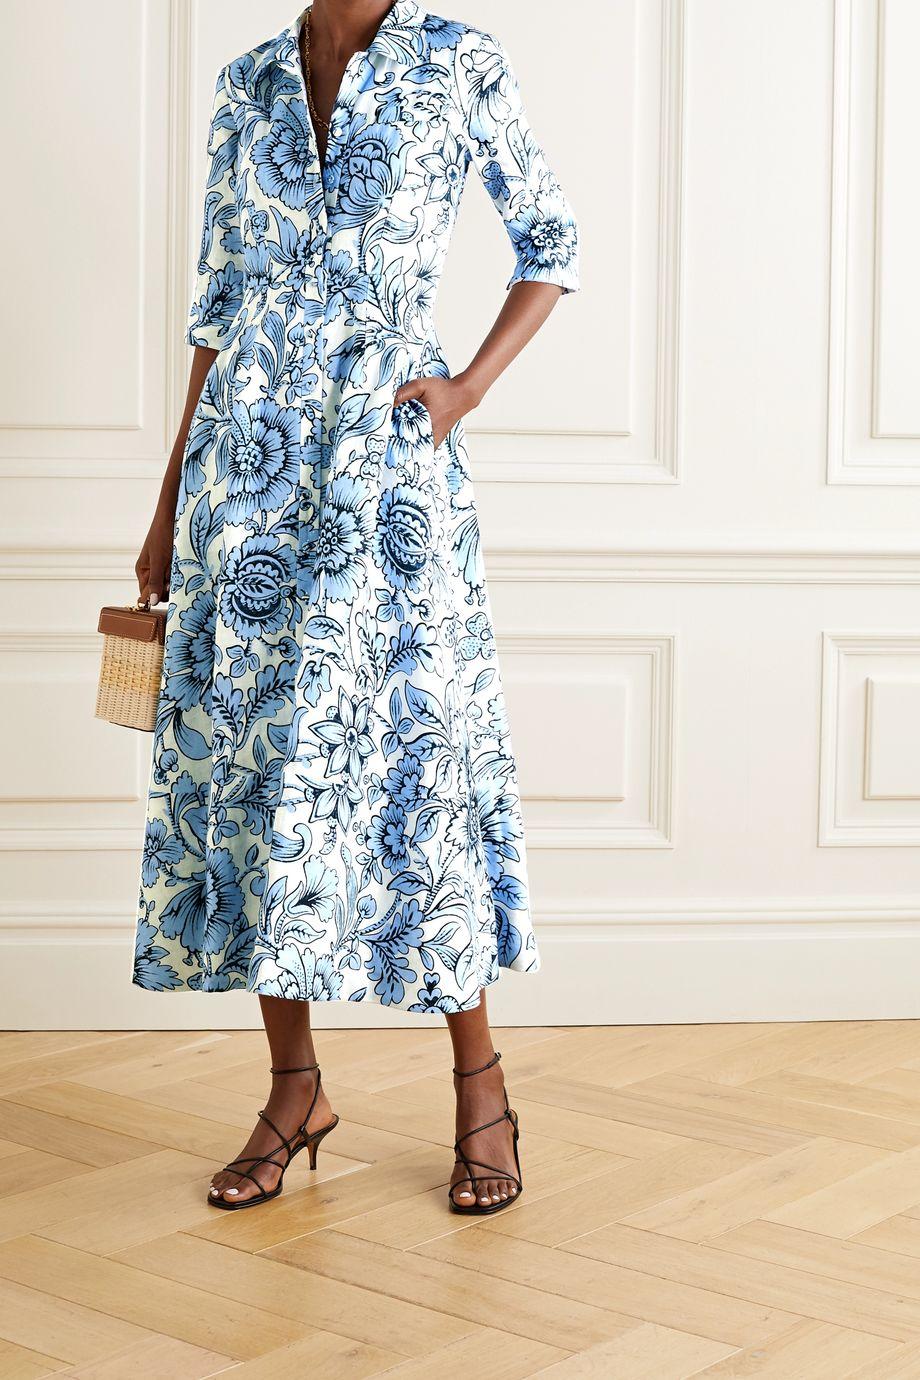 Erdem Kasia floral-print linen midi dress